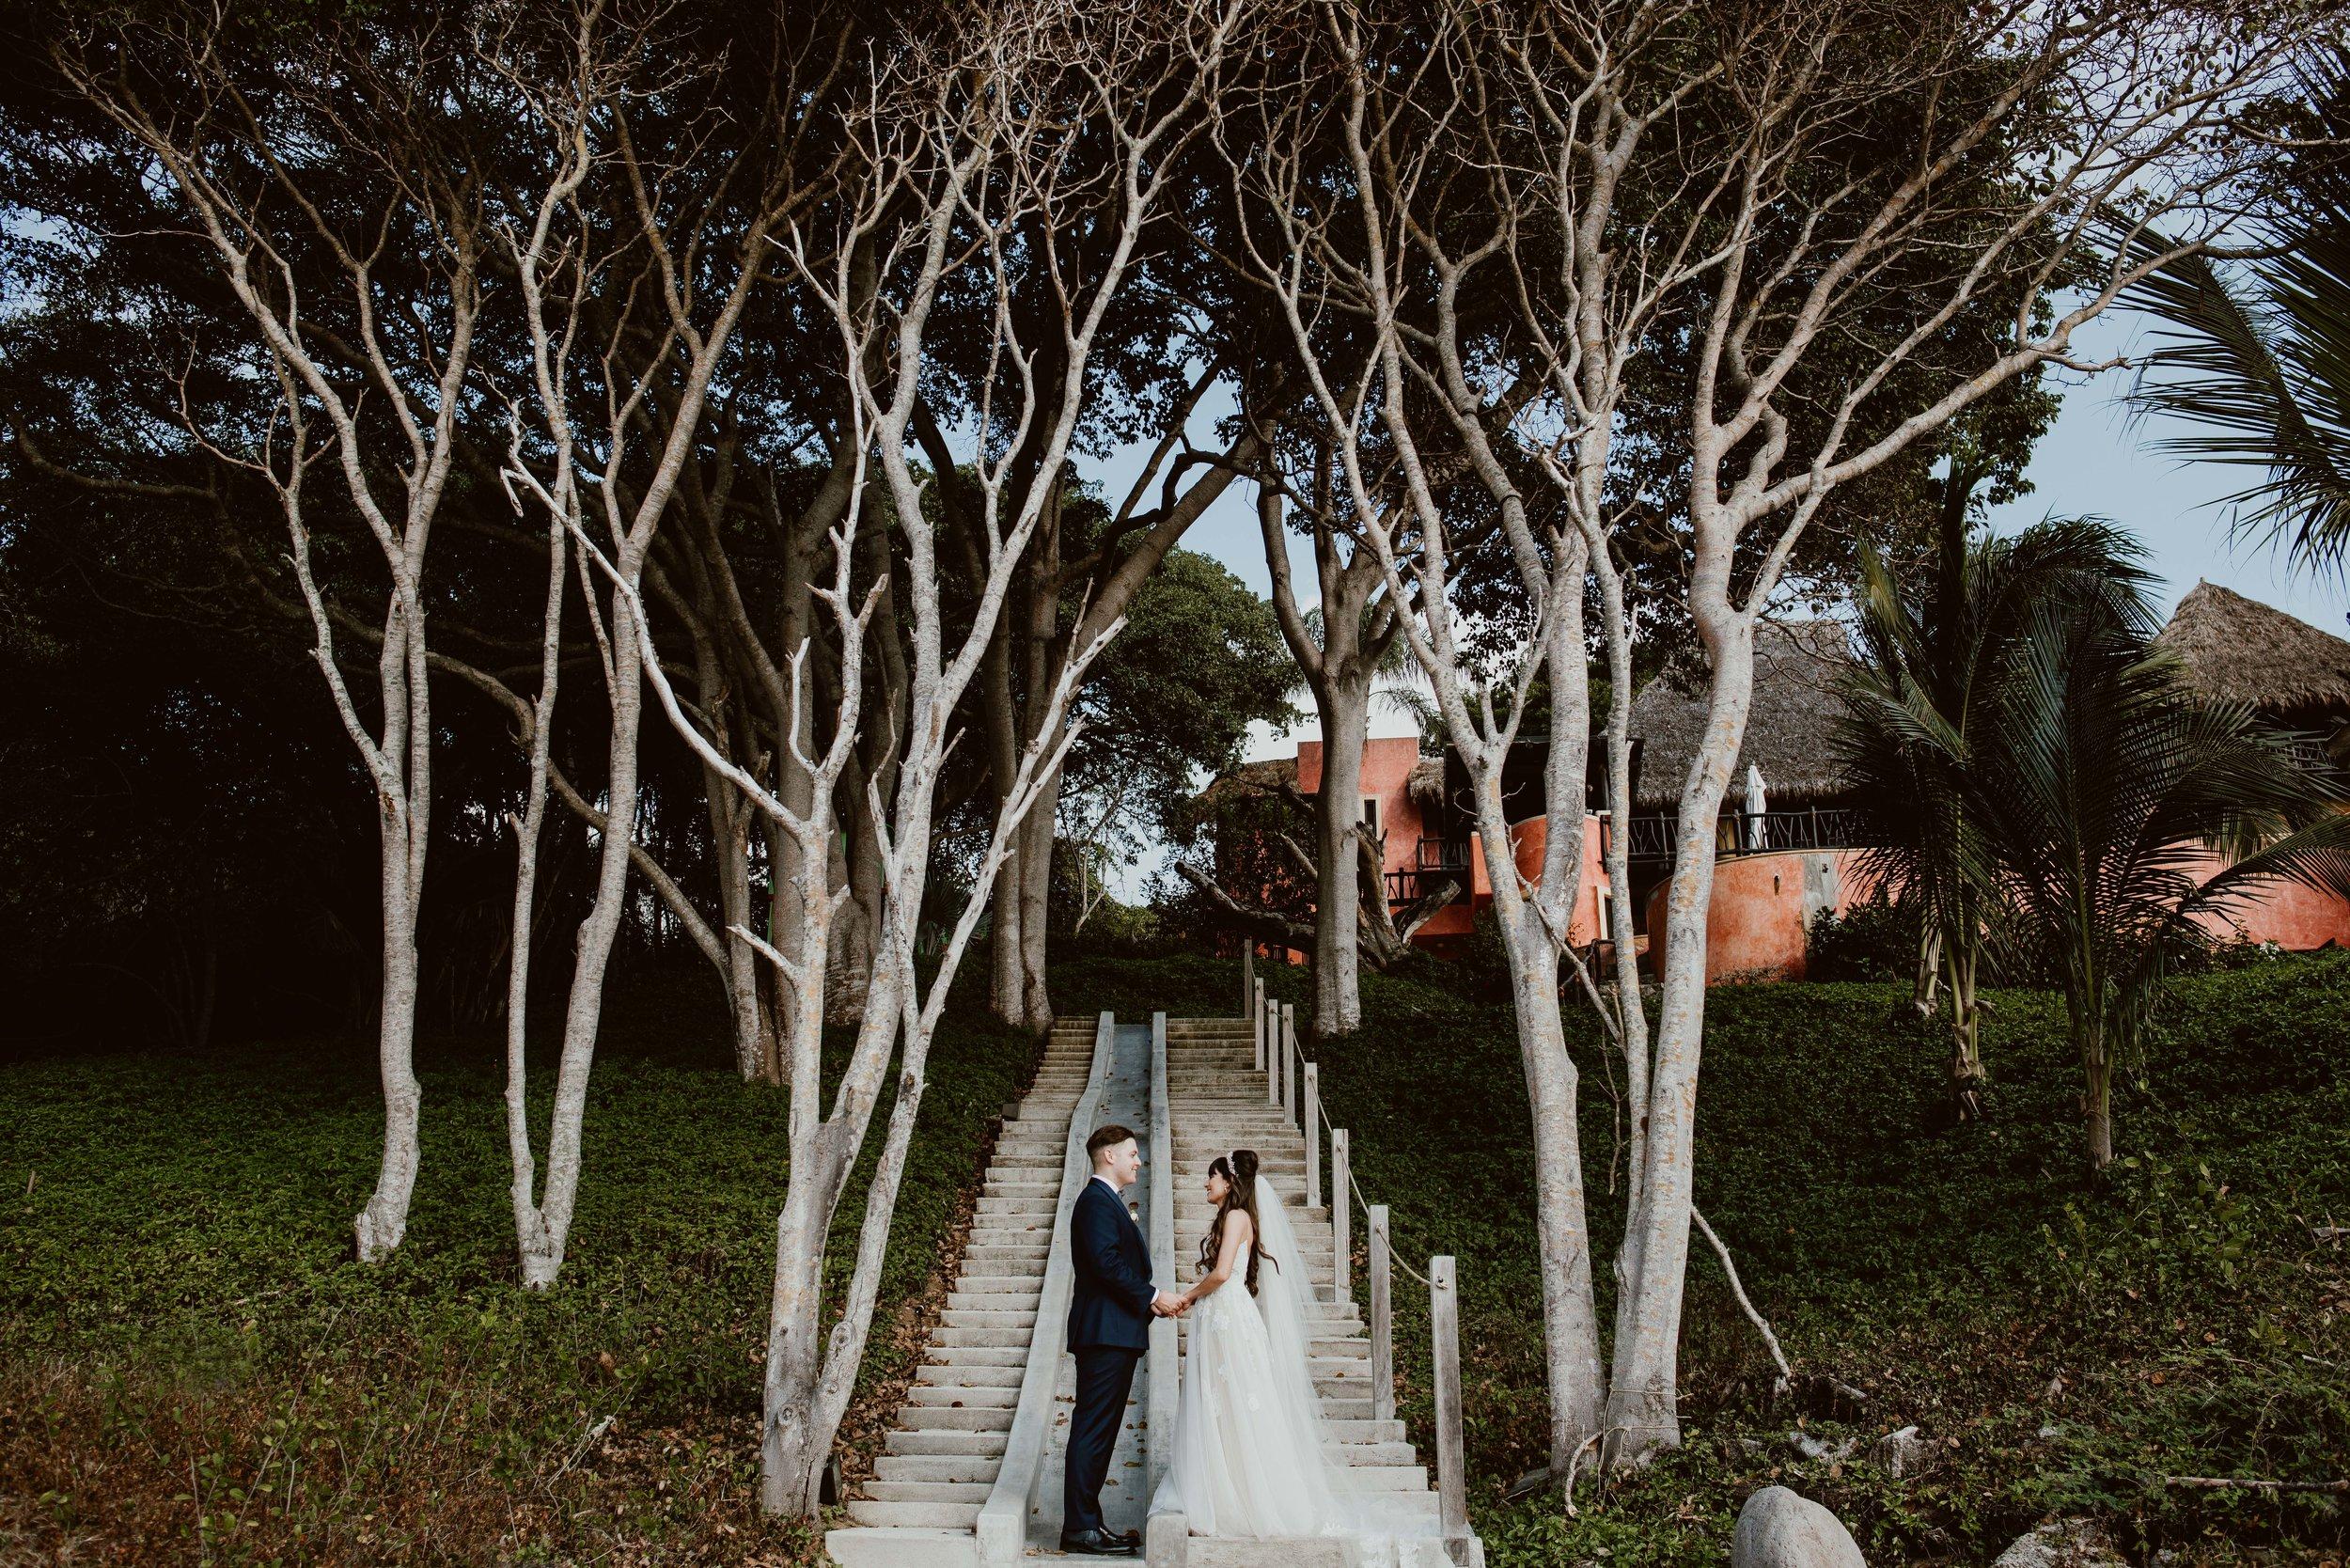 Mariana+Blake Sayulita Wedding-228.jpg